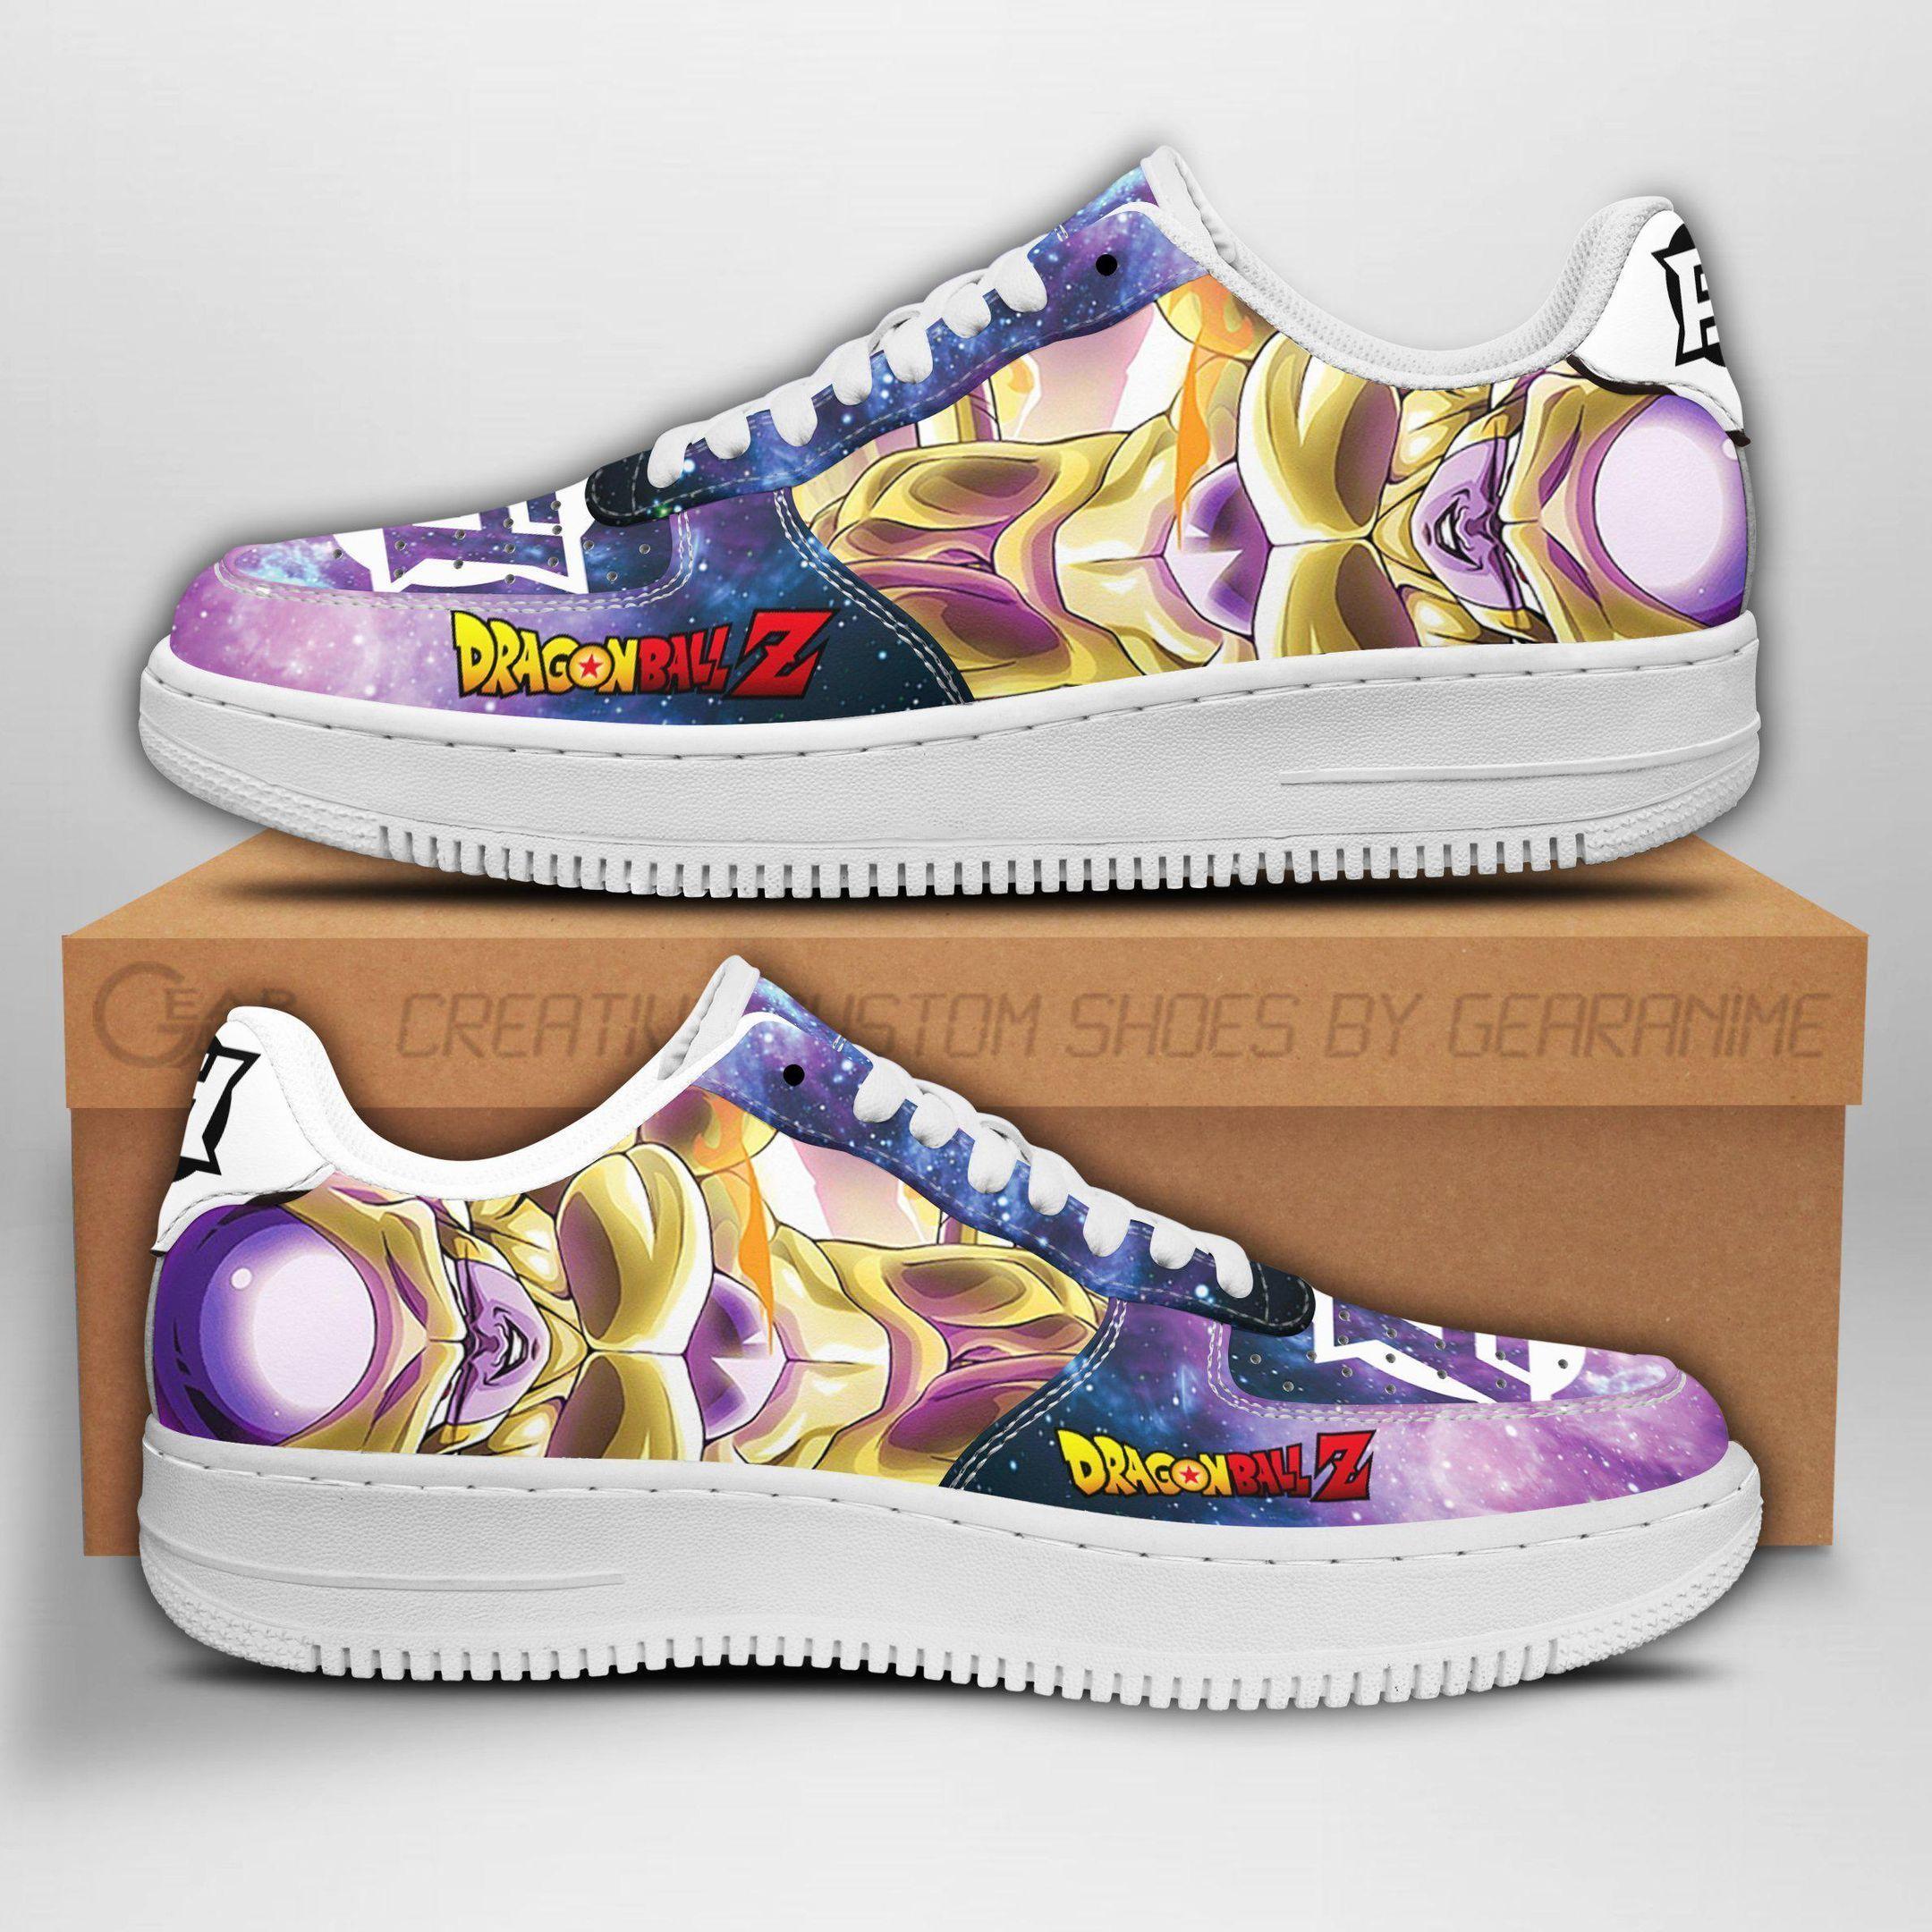 Frieza Air Shoes Dragon Ball Z Anime Shoes Fan Gift GO1012